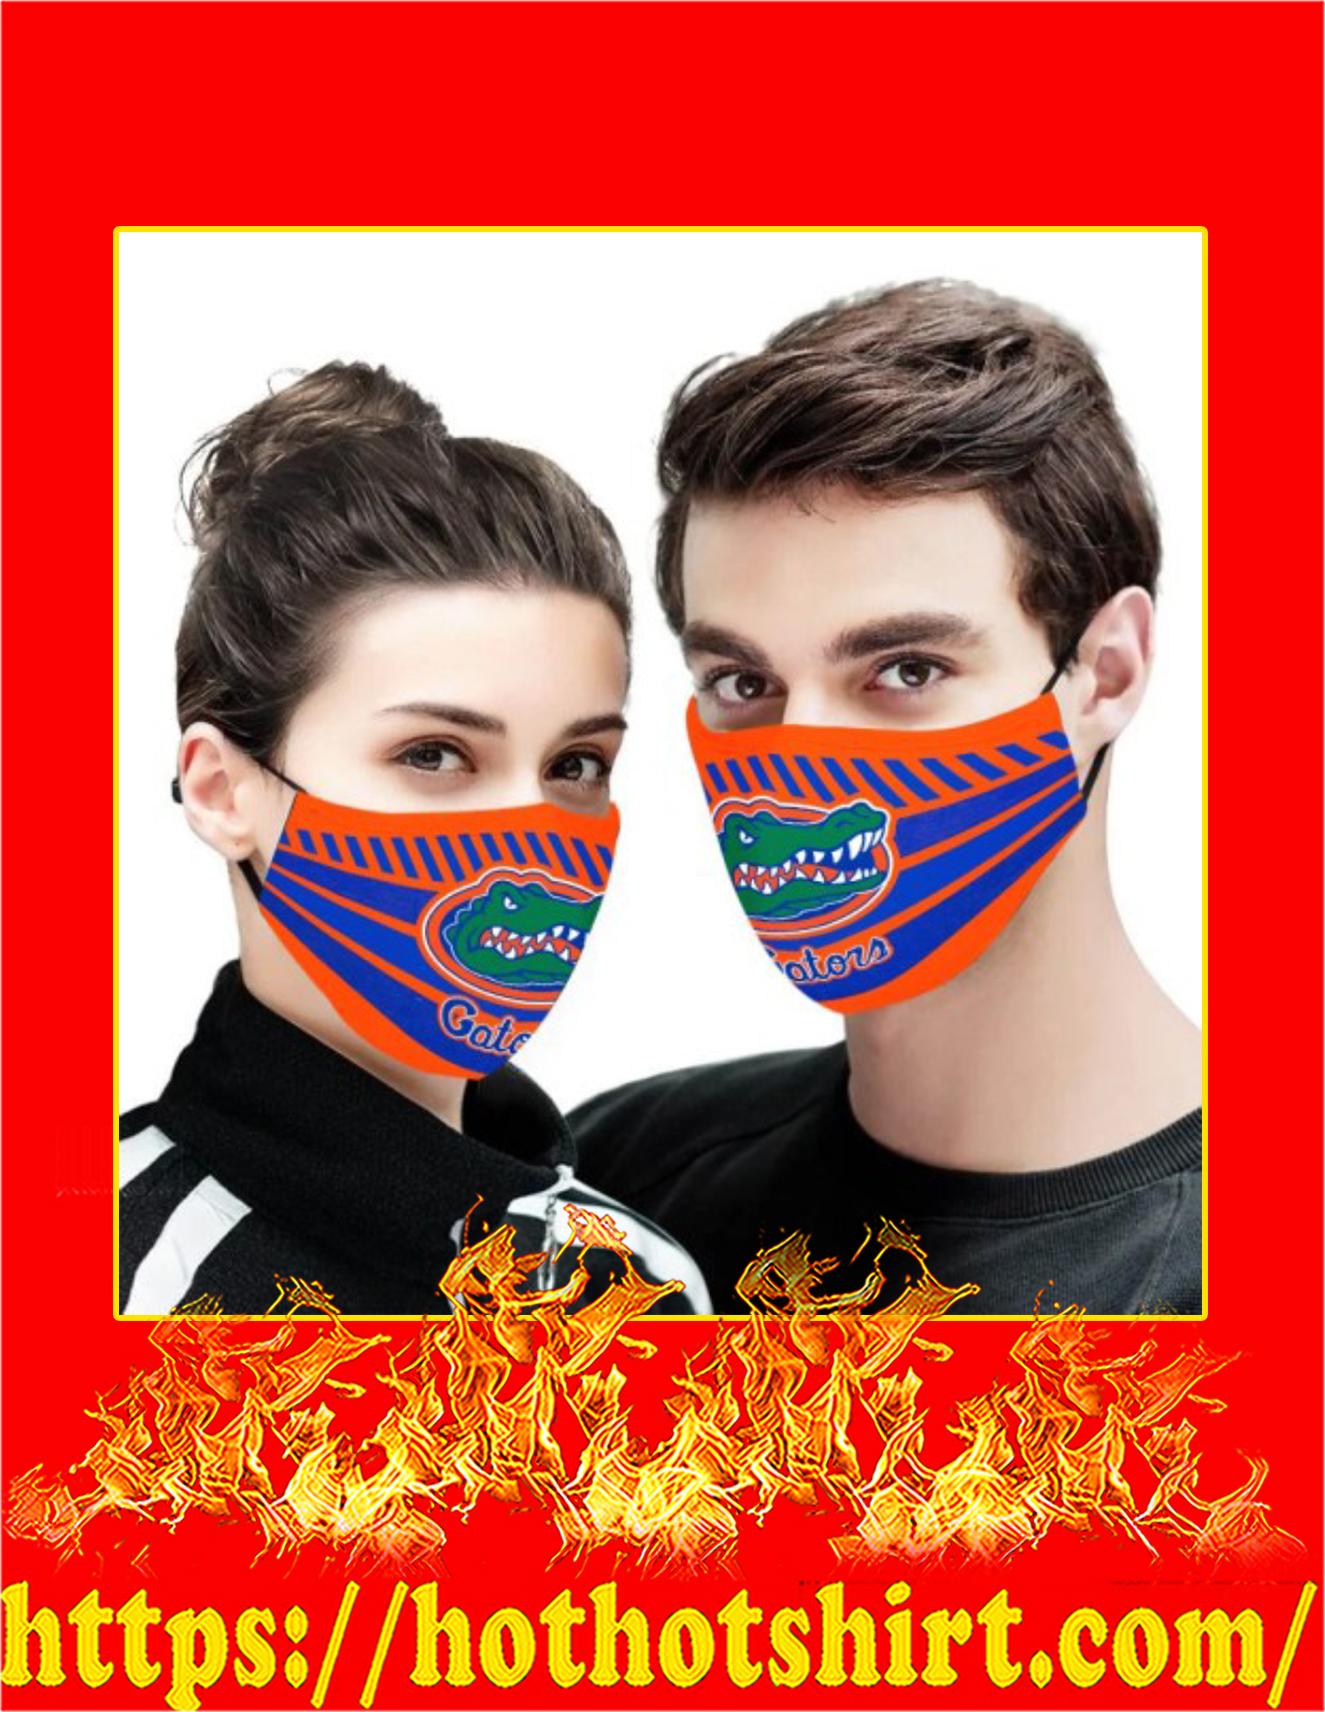 Florida Gators face mask